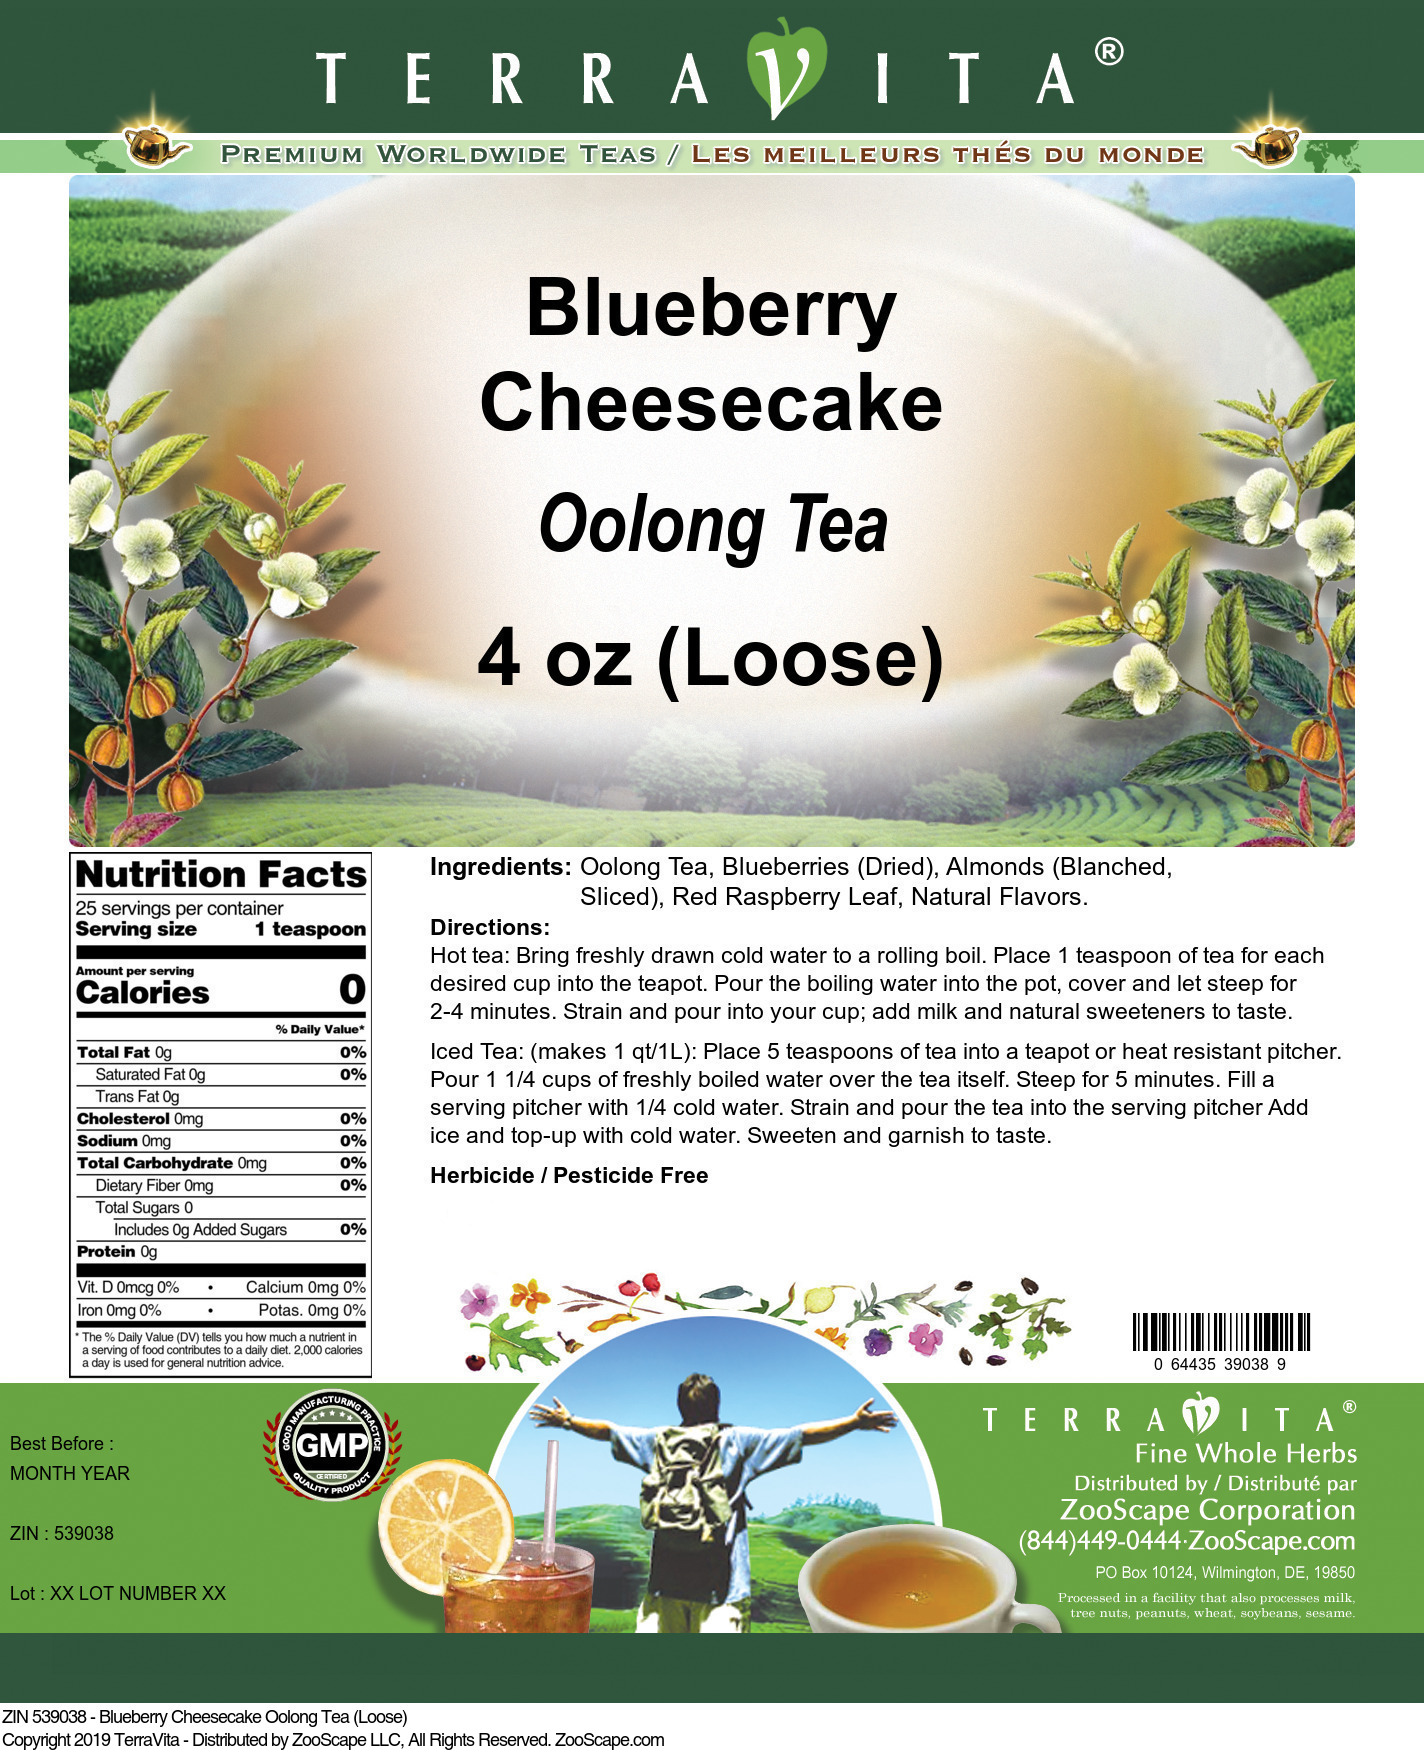 Blueberry Cheesecake Oolong Tea (Loose)